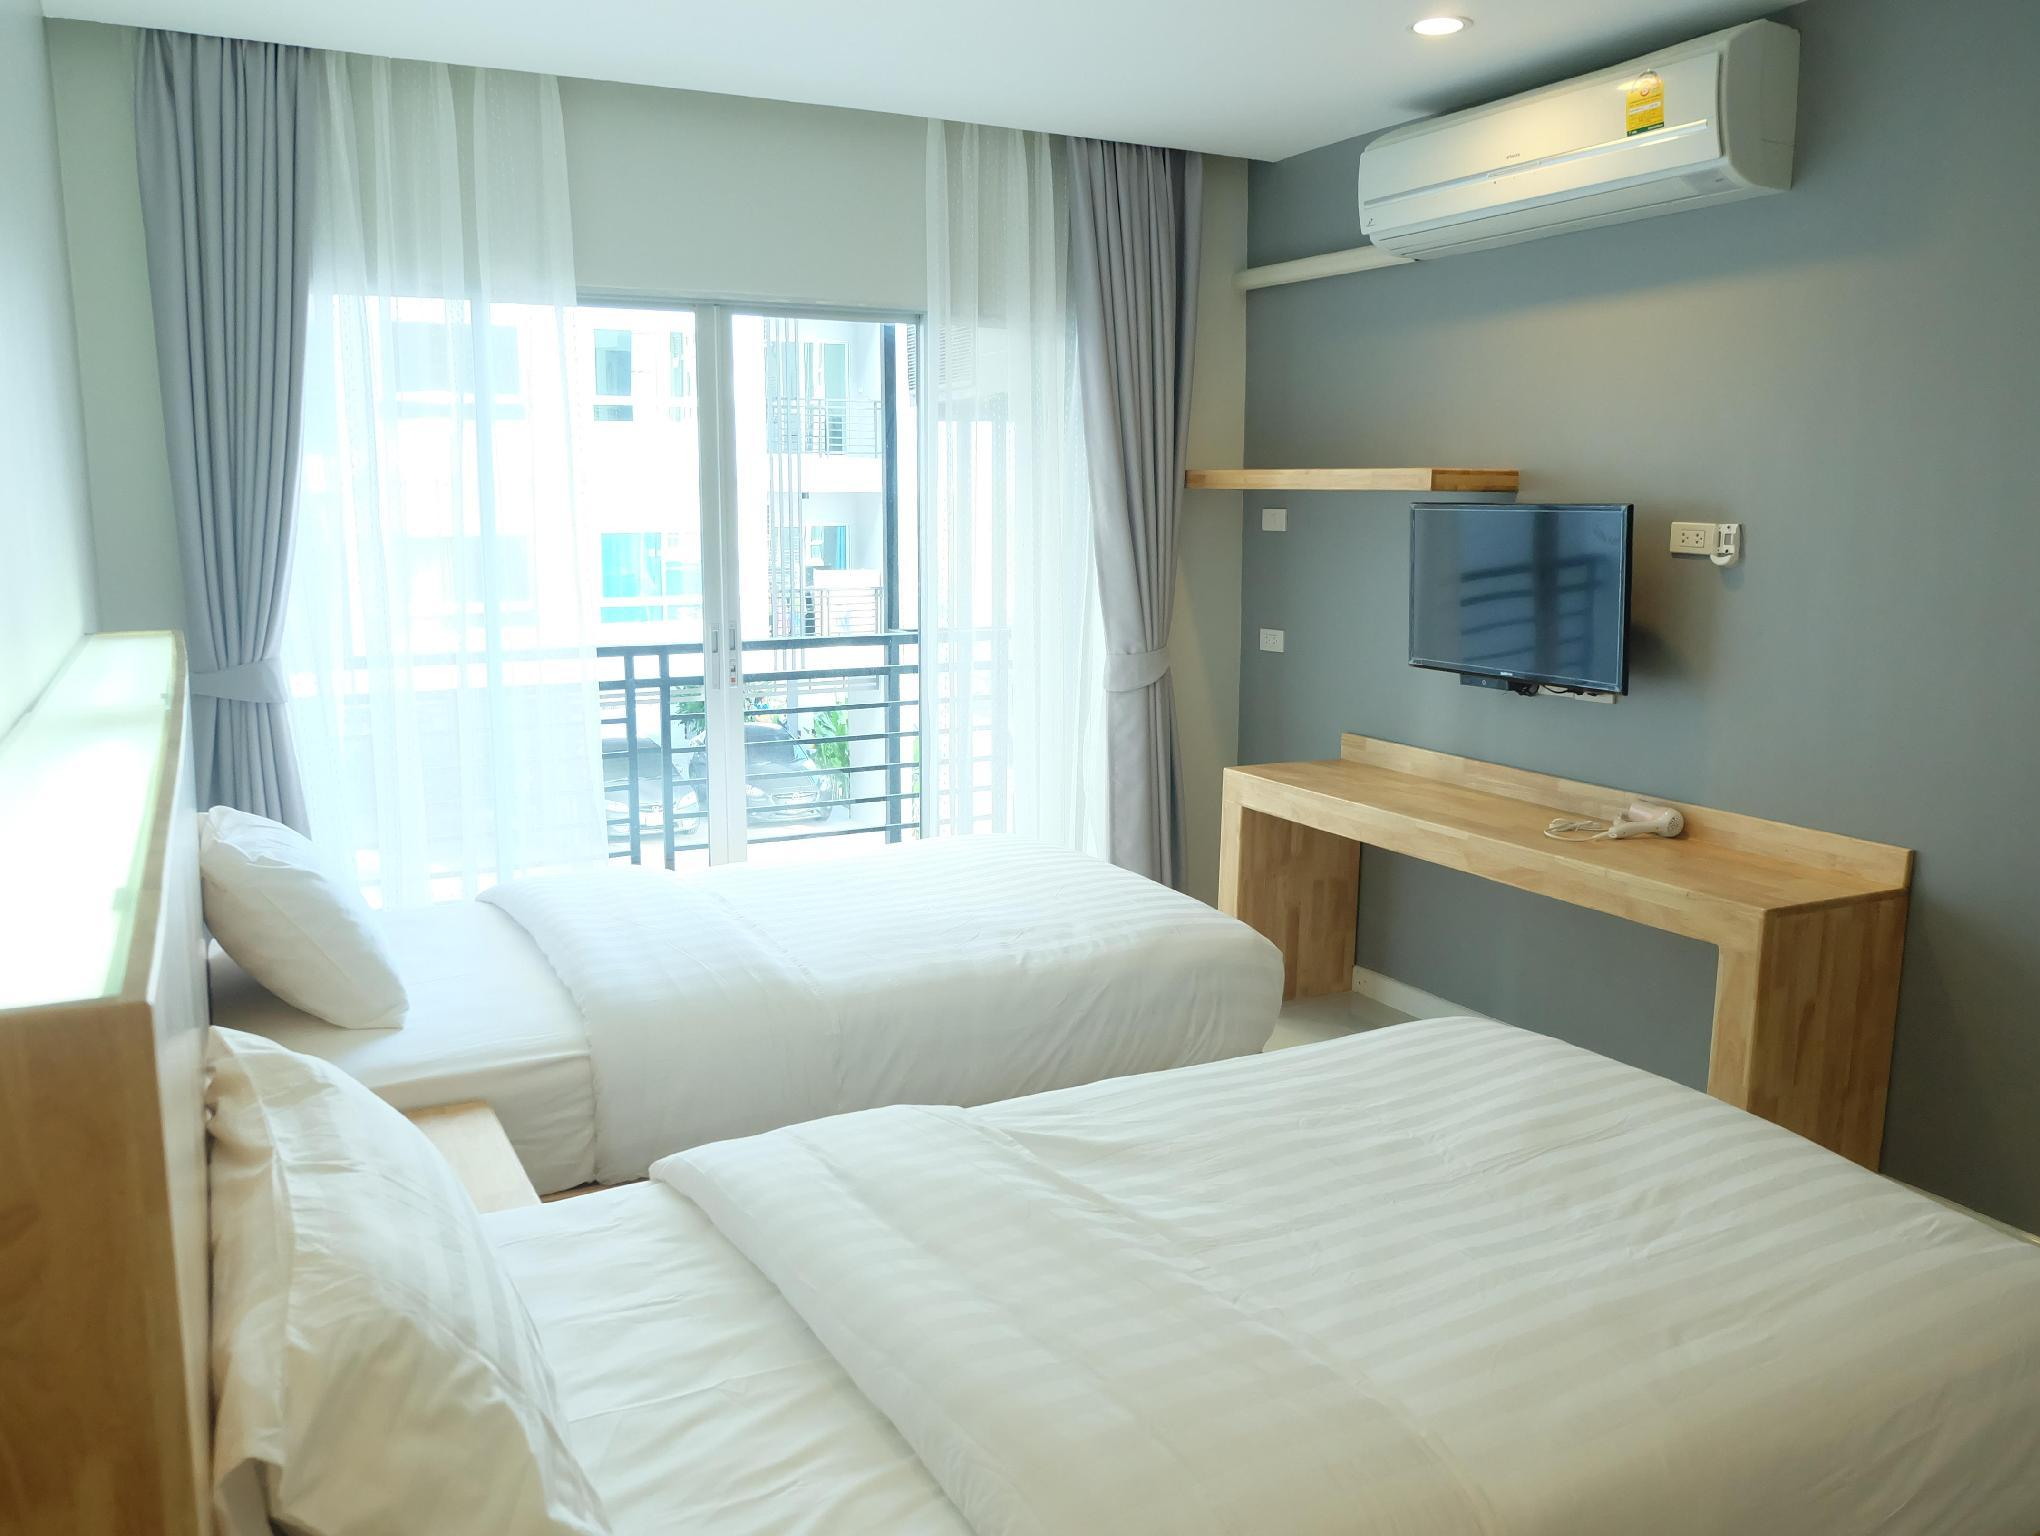 Interpark Hotel & Residence